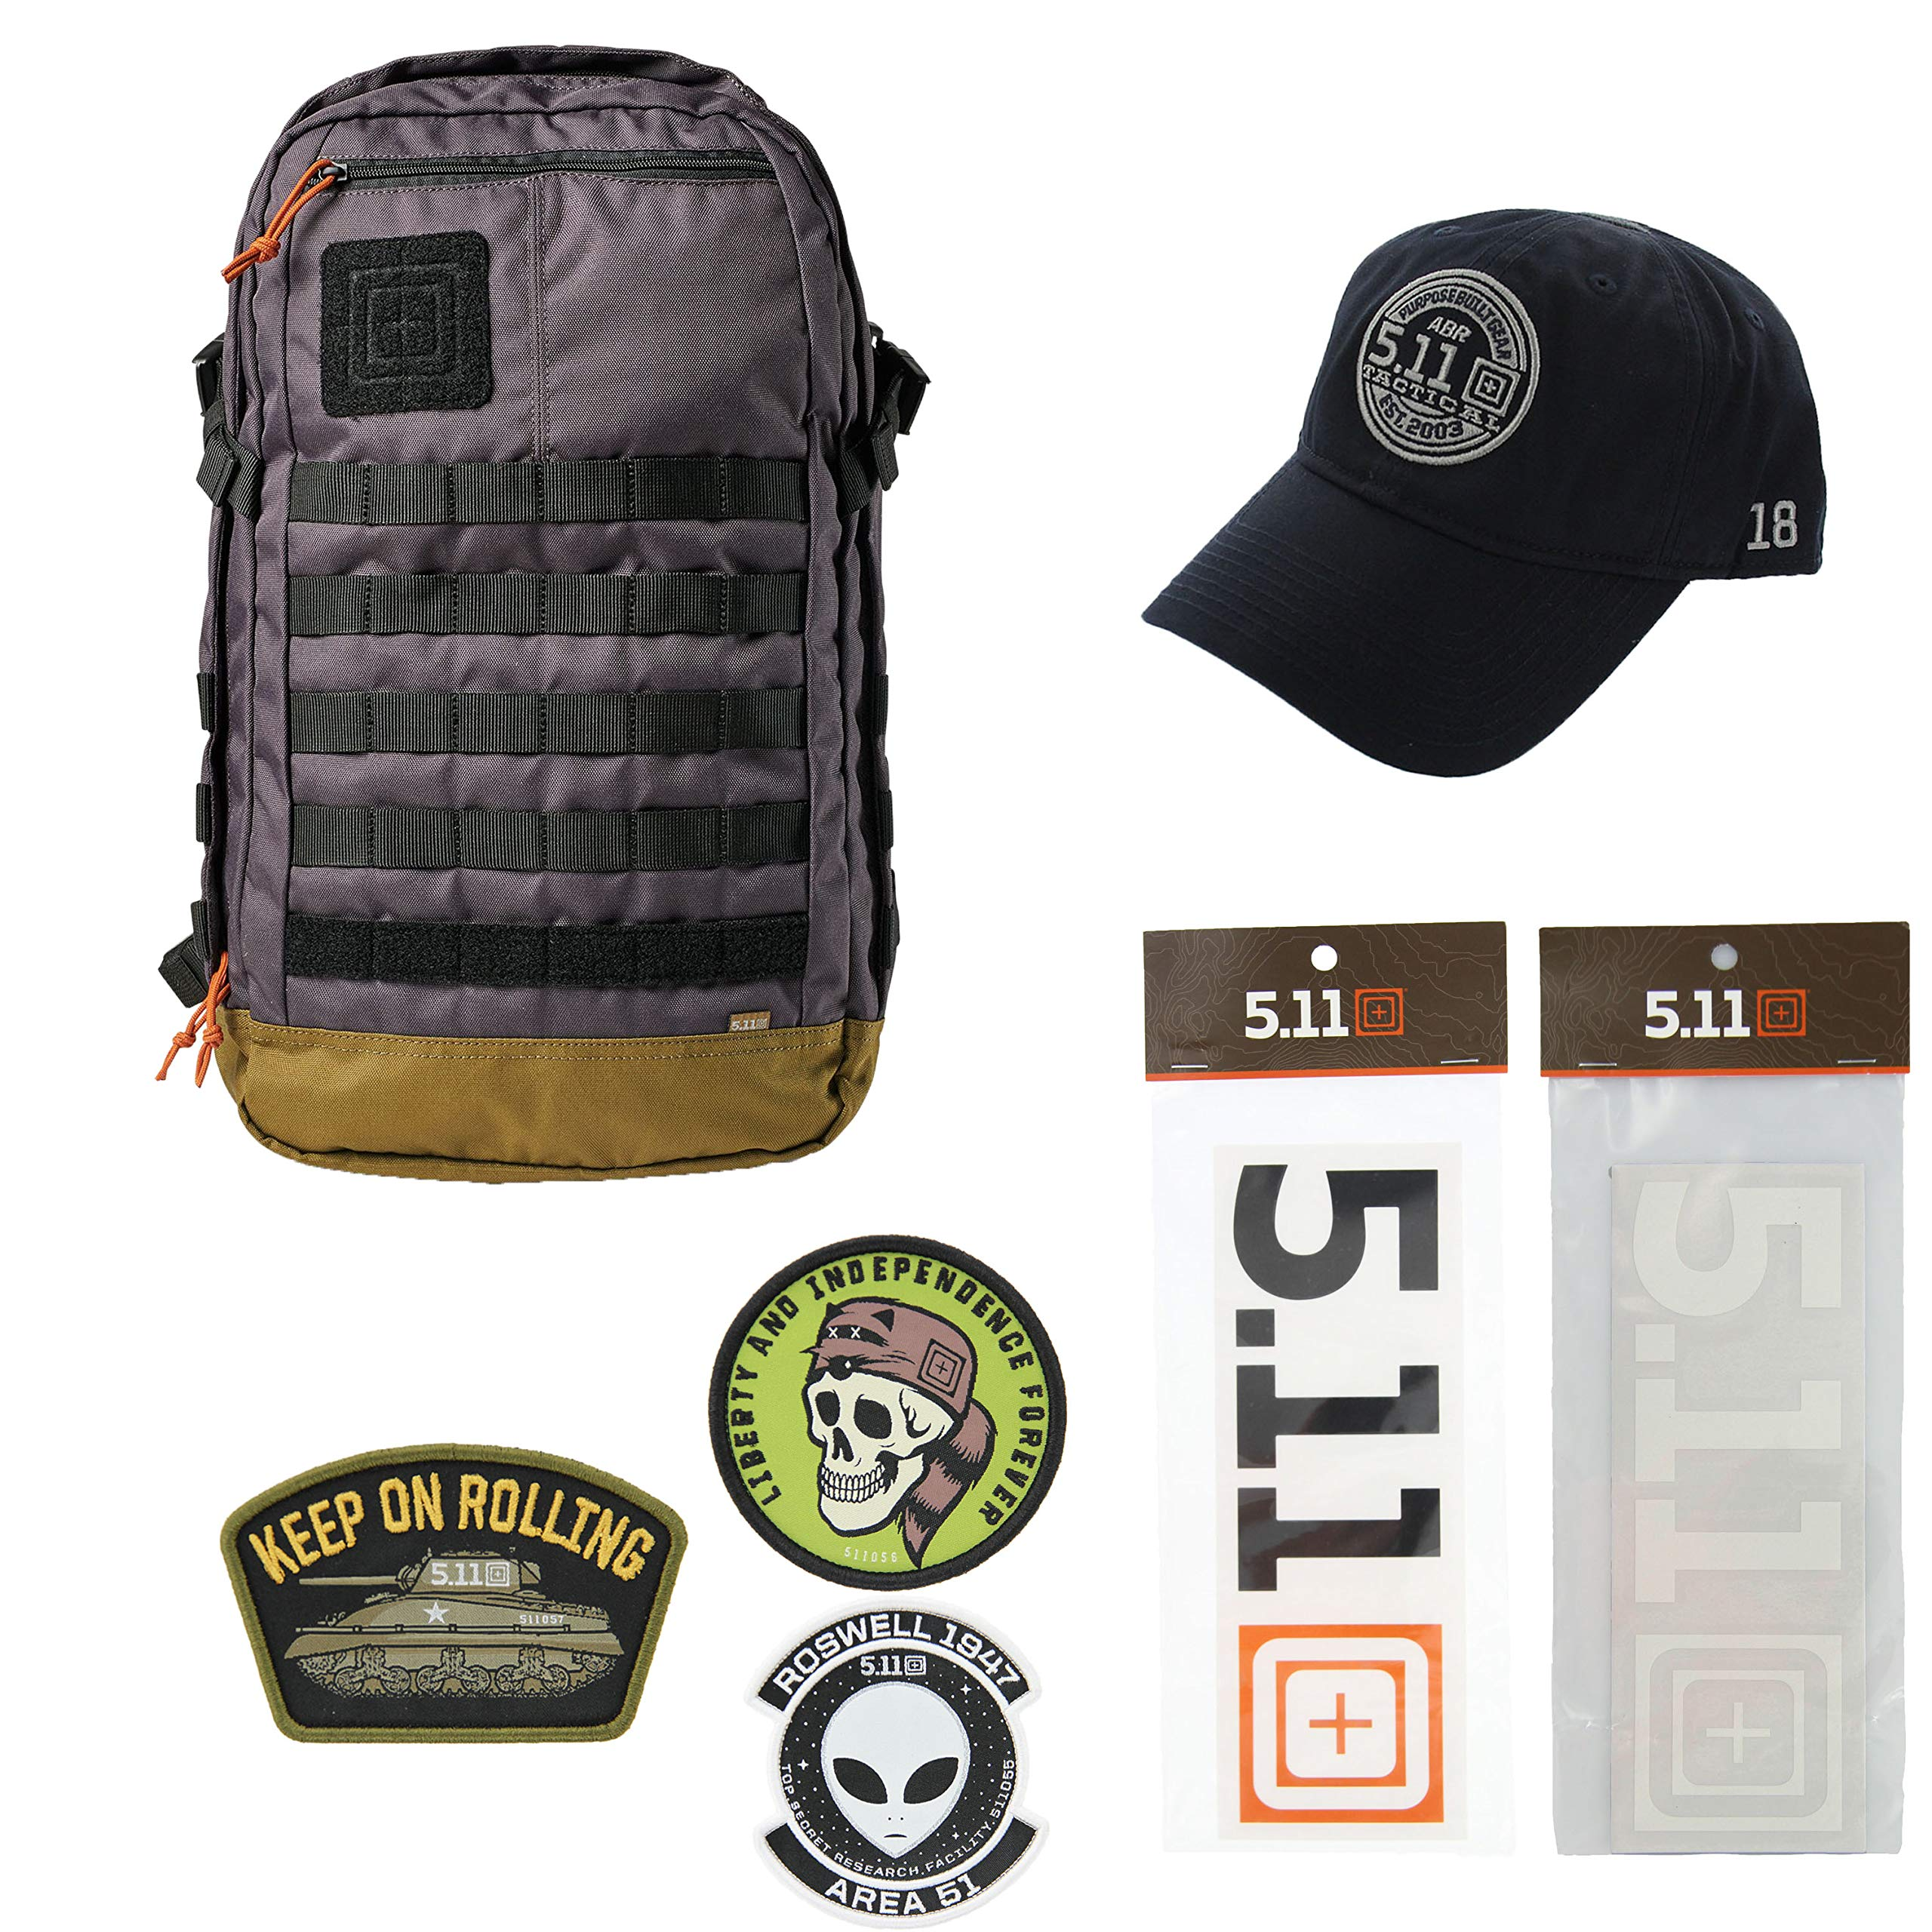 386a5701c42 Amazon.com  5.11  Bags